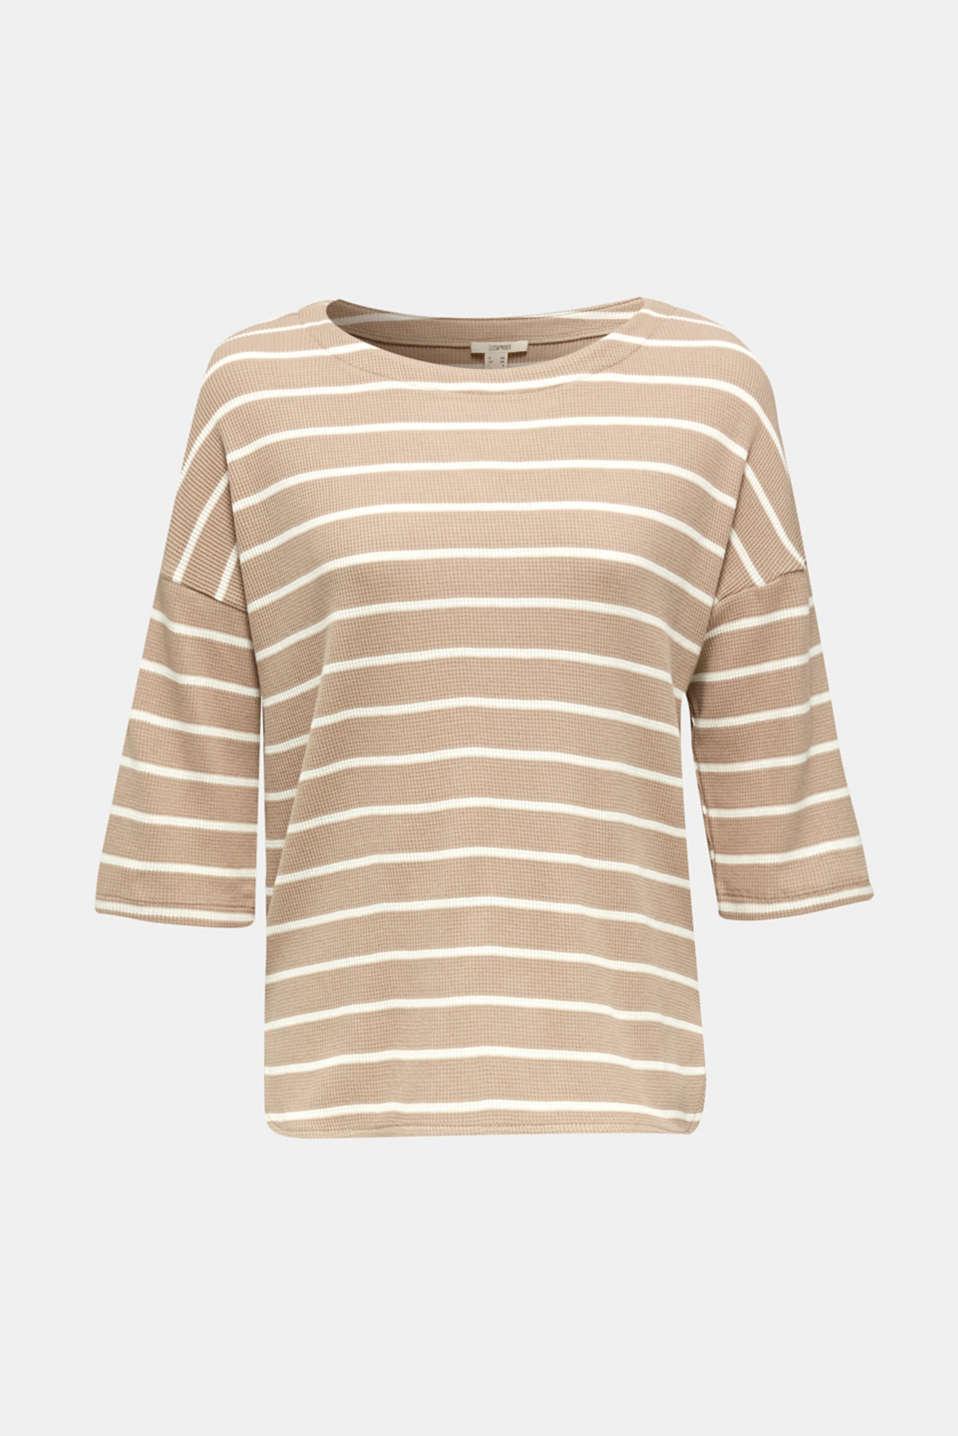 Piqué T-shirt with a casual cut, 100% cotton, BEIGE, detail image number 7